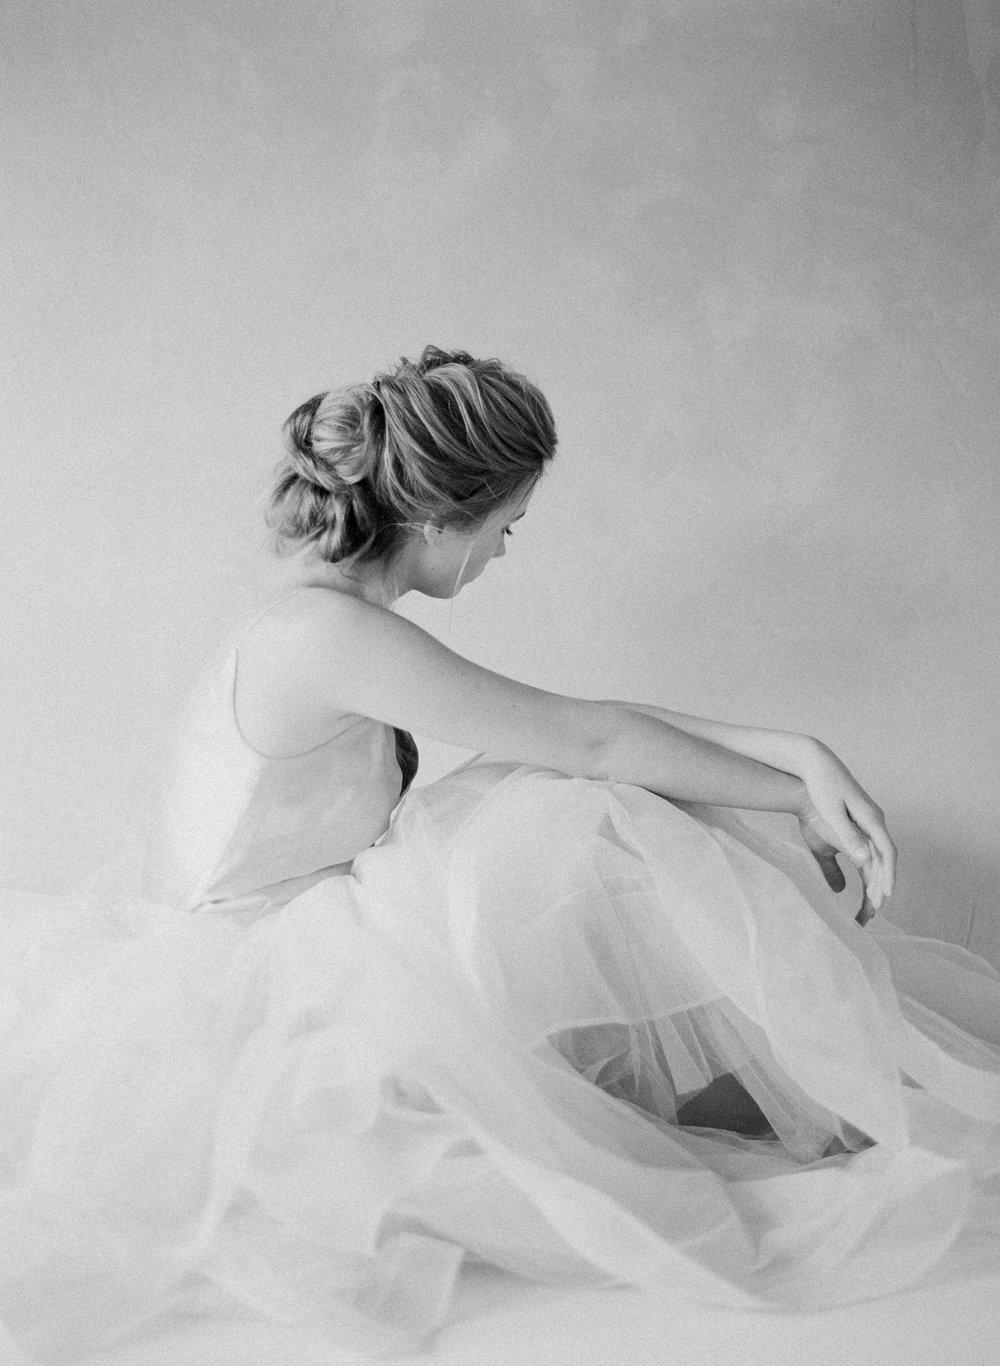 Classic-Bridal-Portraits-218-Jen_Huang-BHLDN-Winter-Bride-282-Jen_Huang-000086620001.jpg